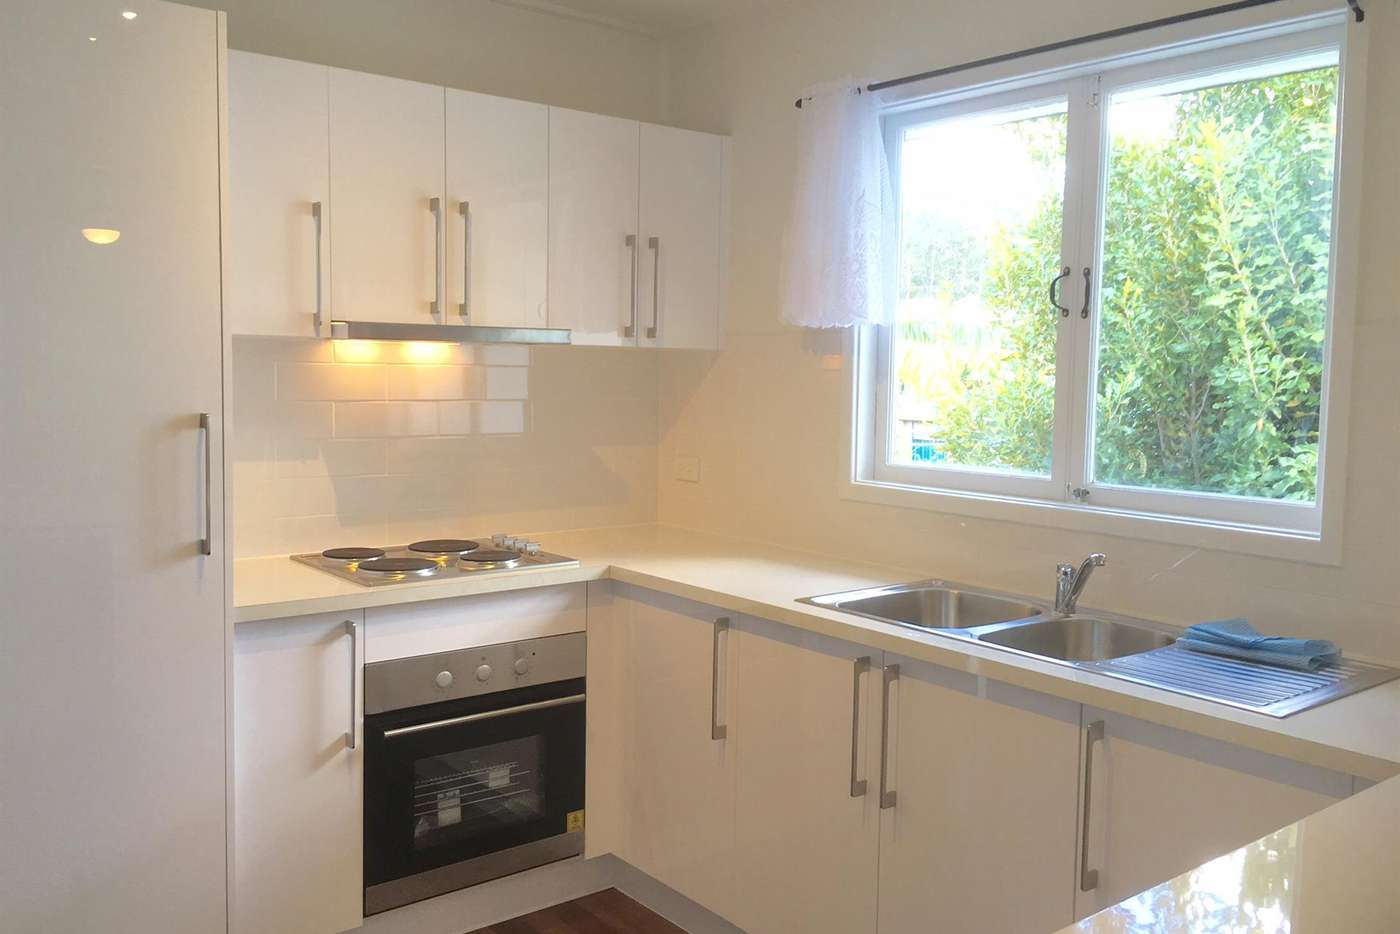 Main view of Homely house listing, 4 Malvern  Street, Salisbury QLD 4107